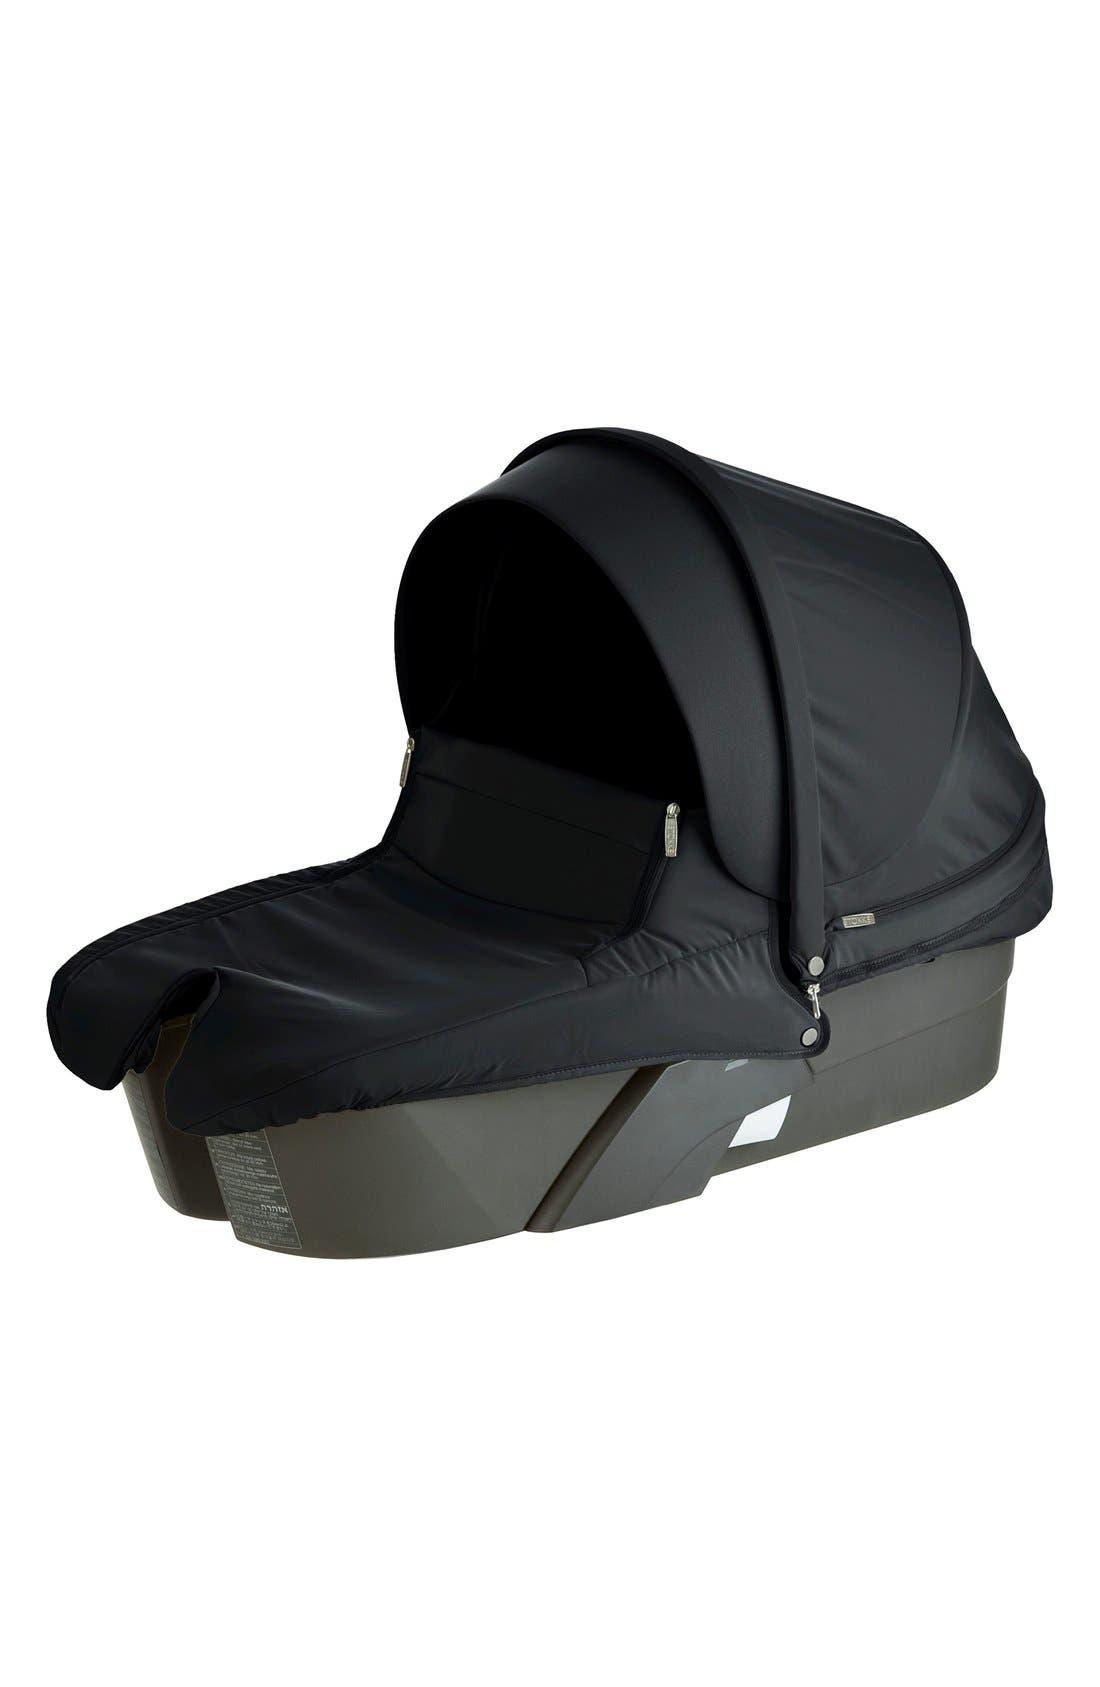 Main Image - Stokke 'Xplory®' Stroller Carry Cot